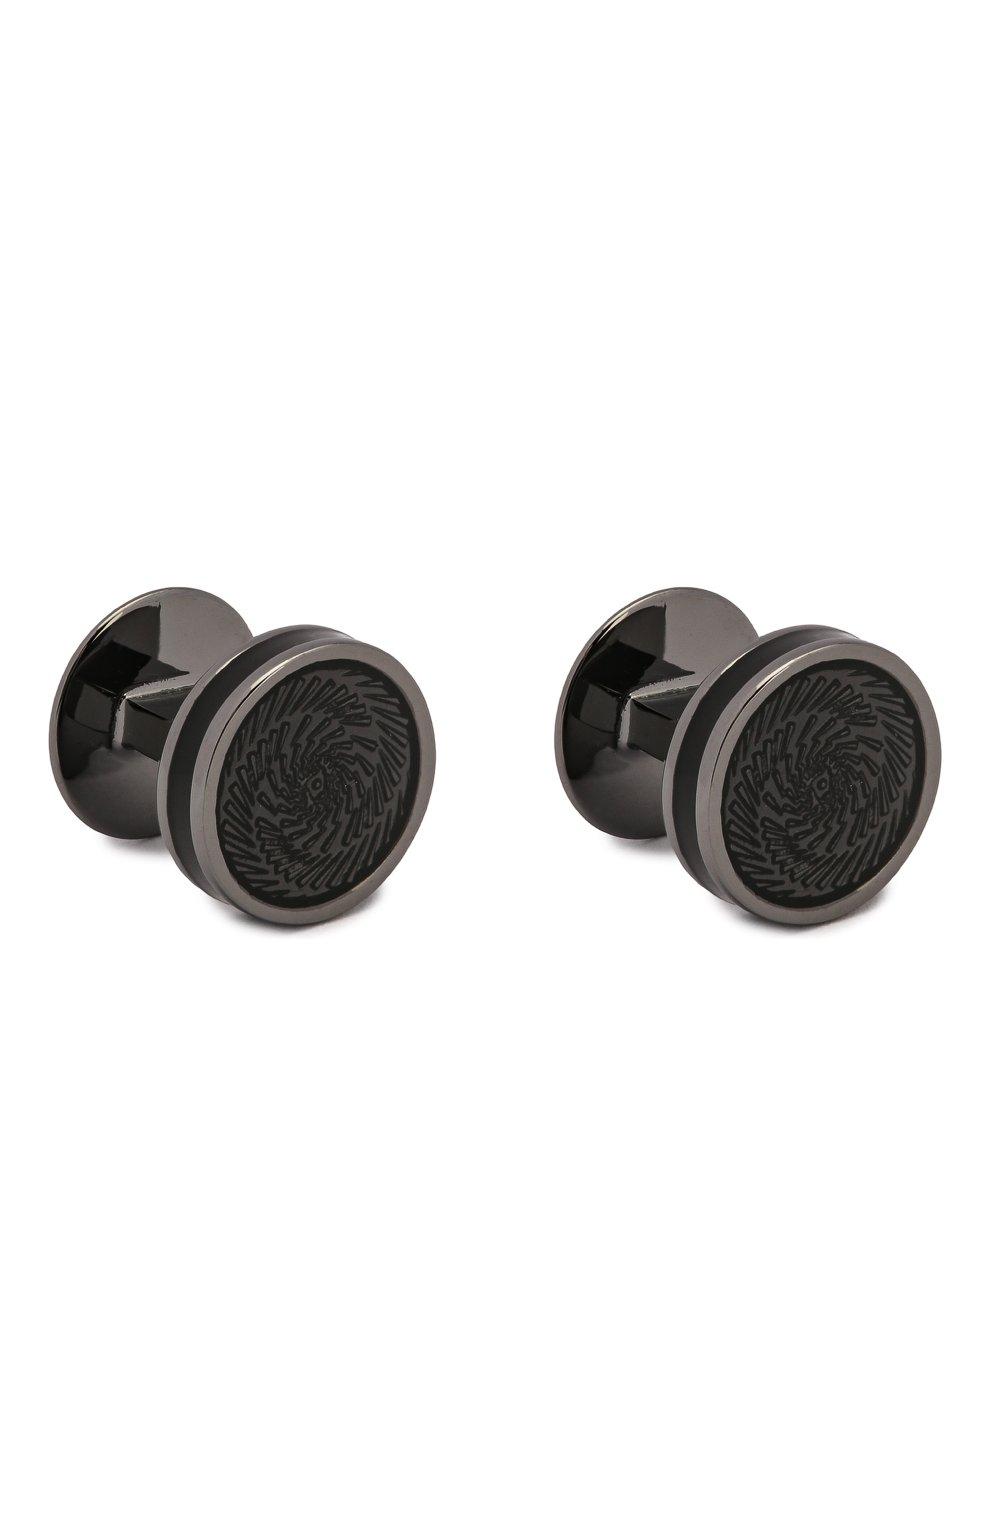 Мужские комплект из запонок и пуговиц TATEOSSIAN черного цвета, арт. SC0266 | Фото 4 (Стили: Классический; Материал: Металл)